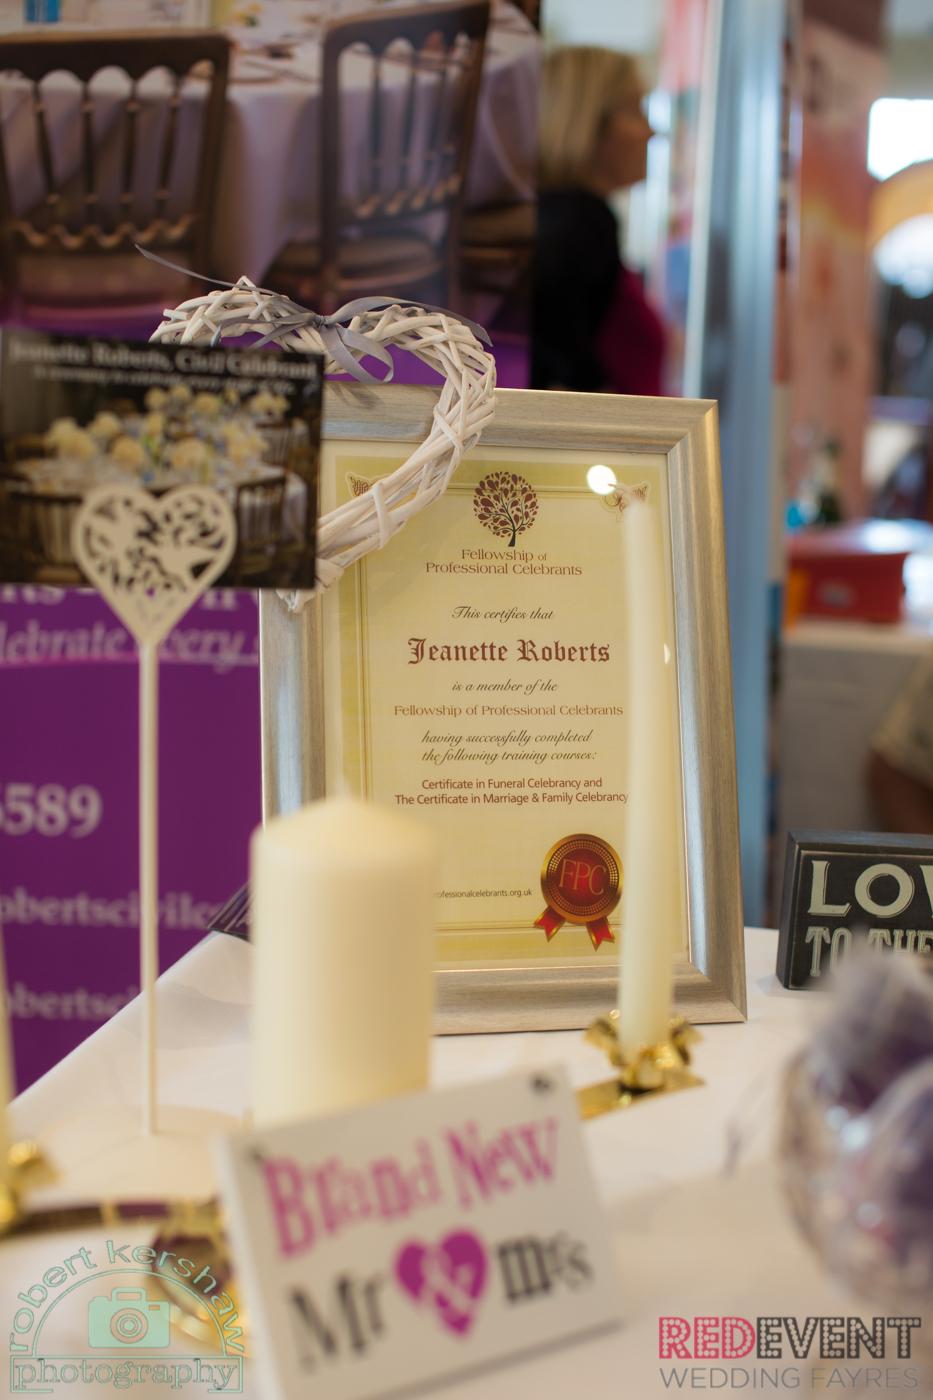 Jeanette Roberts Civil Celebrant special offer for Formby Hall Wedding Fayre Liverpool Wedding Fair Merseyside Weddings www.redeventweddingfayres.com.jpg